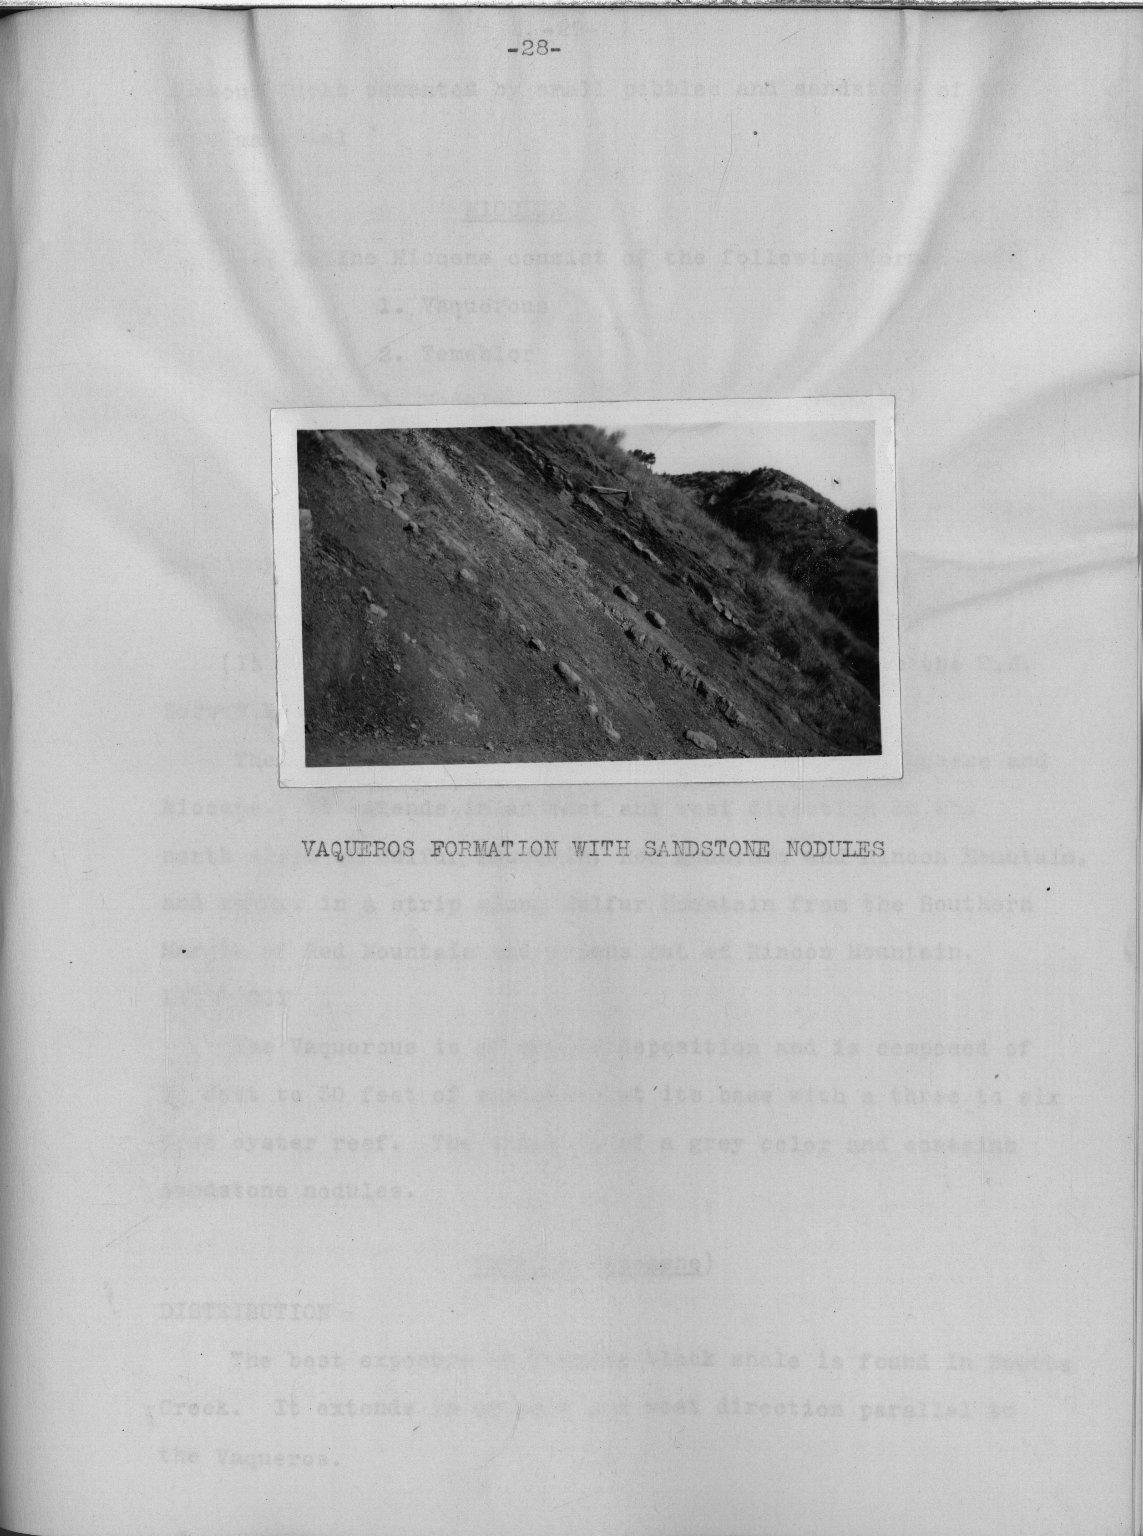 Geology of the Ventura quadrangle